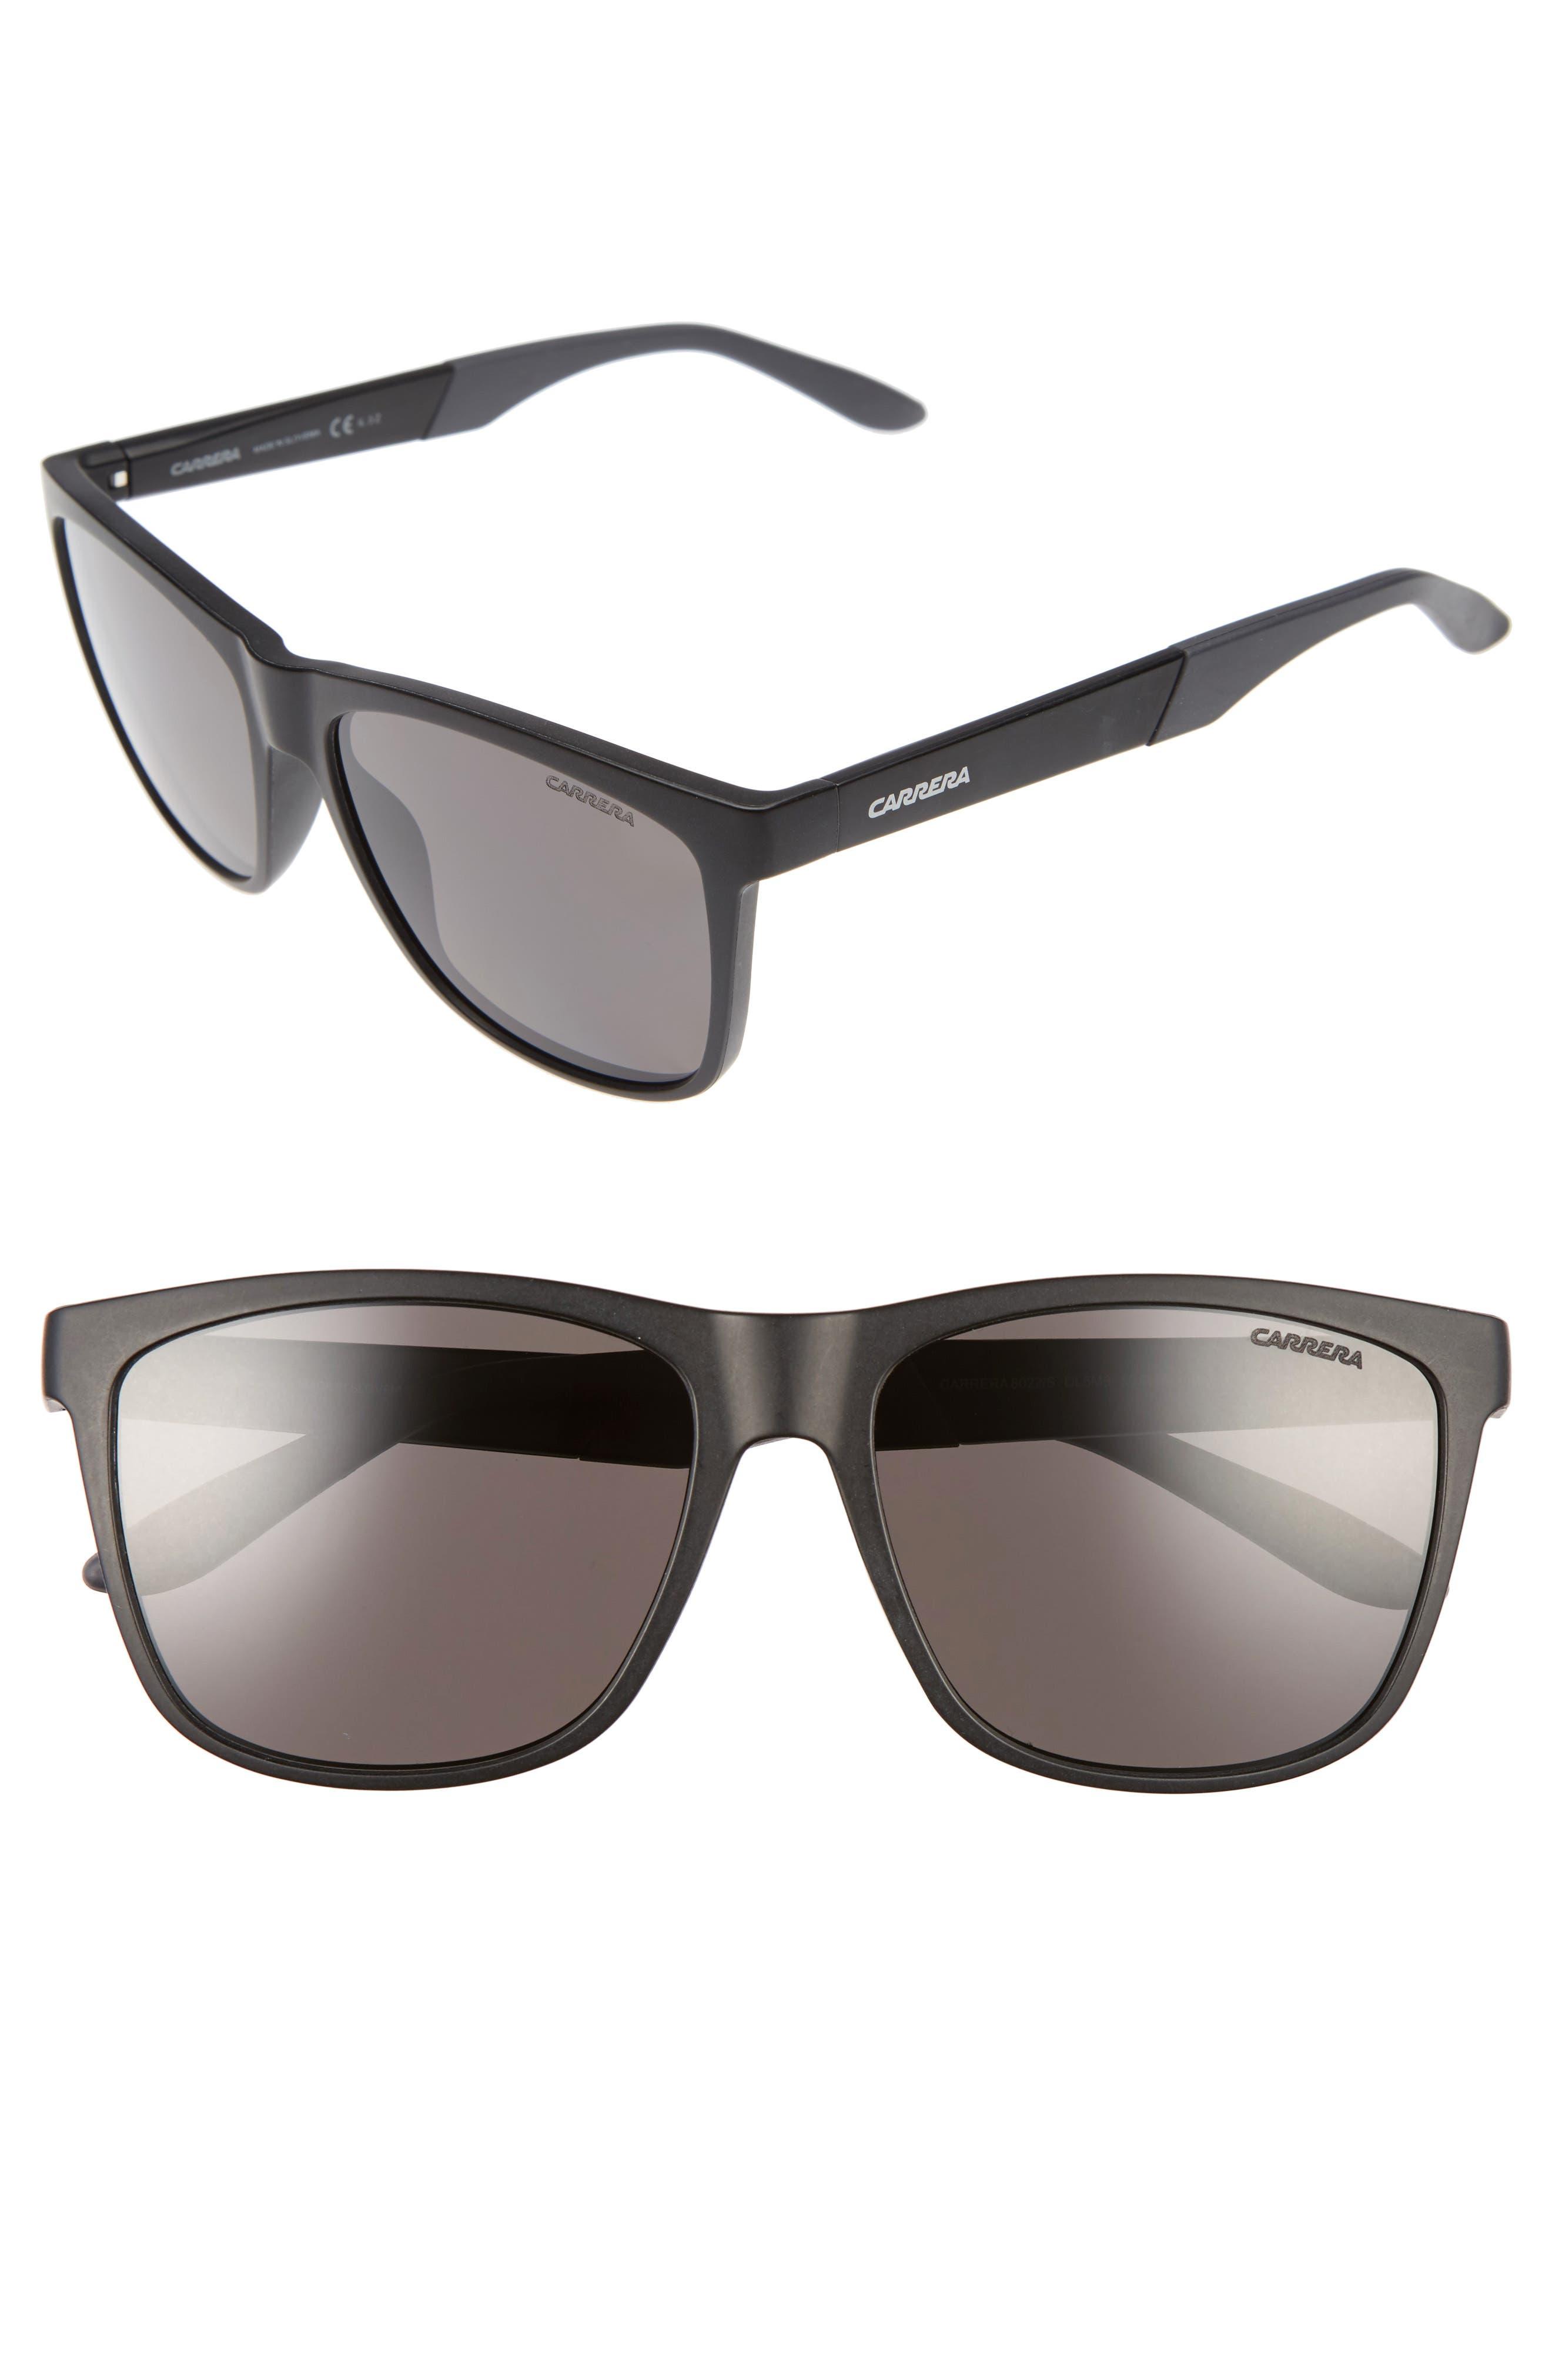 Carrera Eyewear 8022/s 5m Polarized Sunglasses - Matte Black